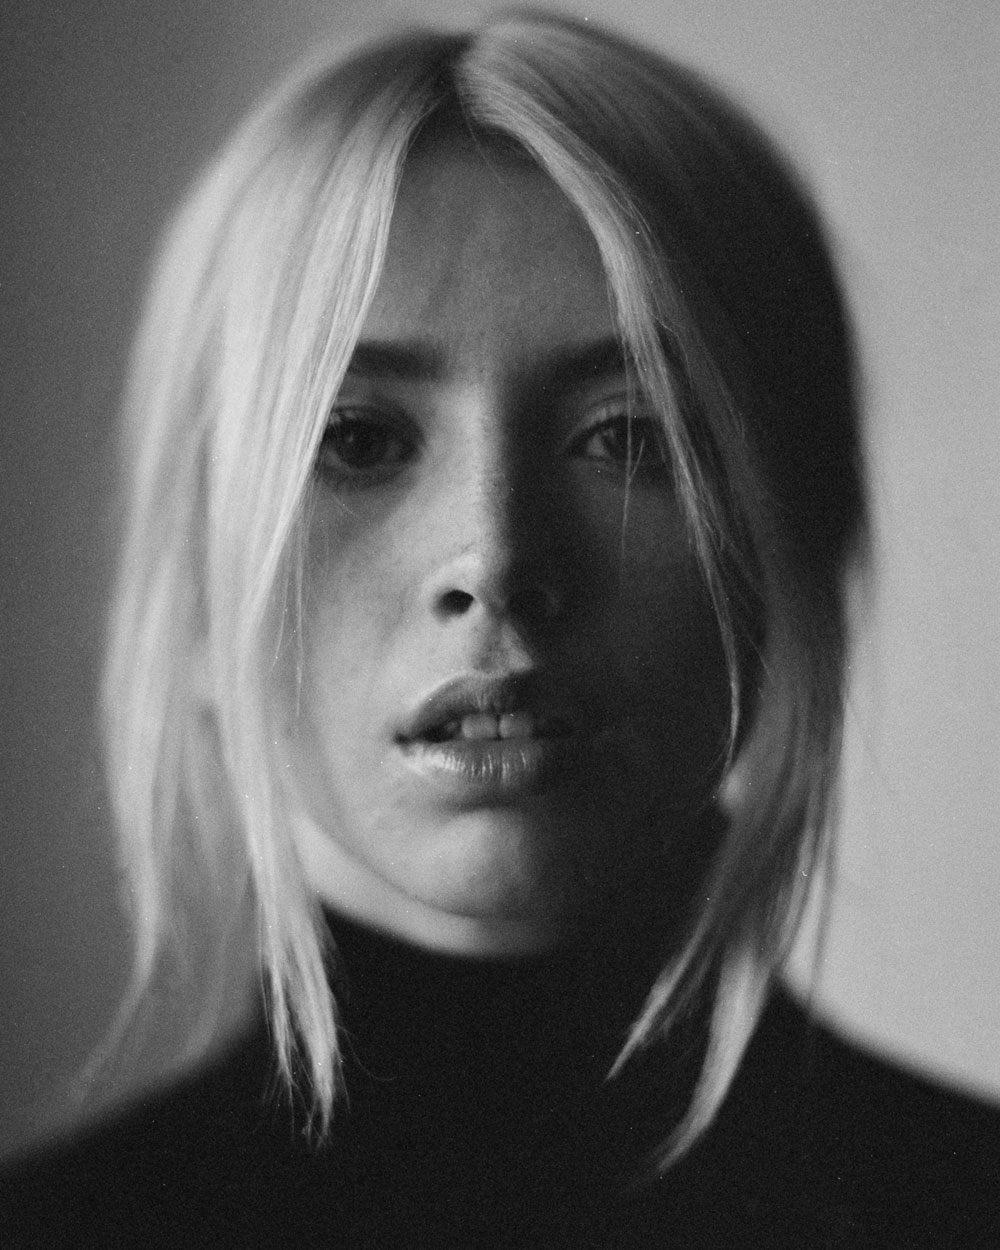 Chris Henderson: Portraits on film